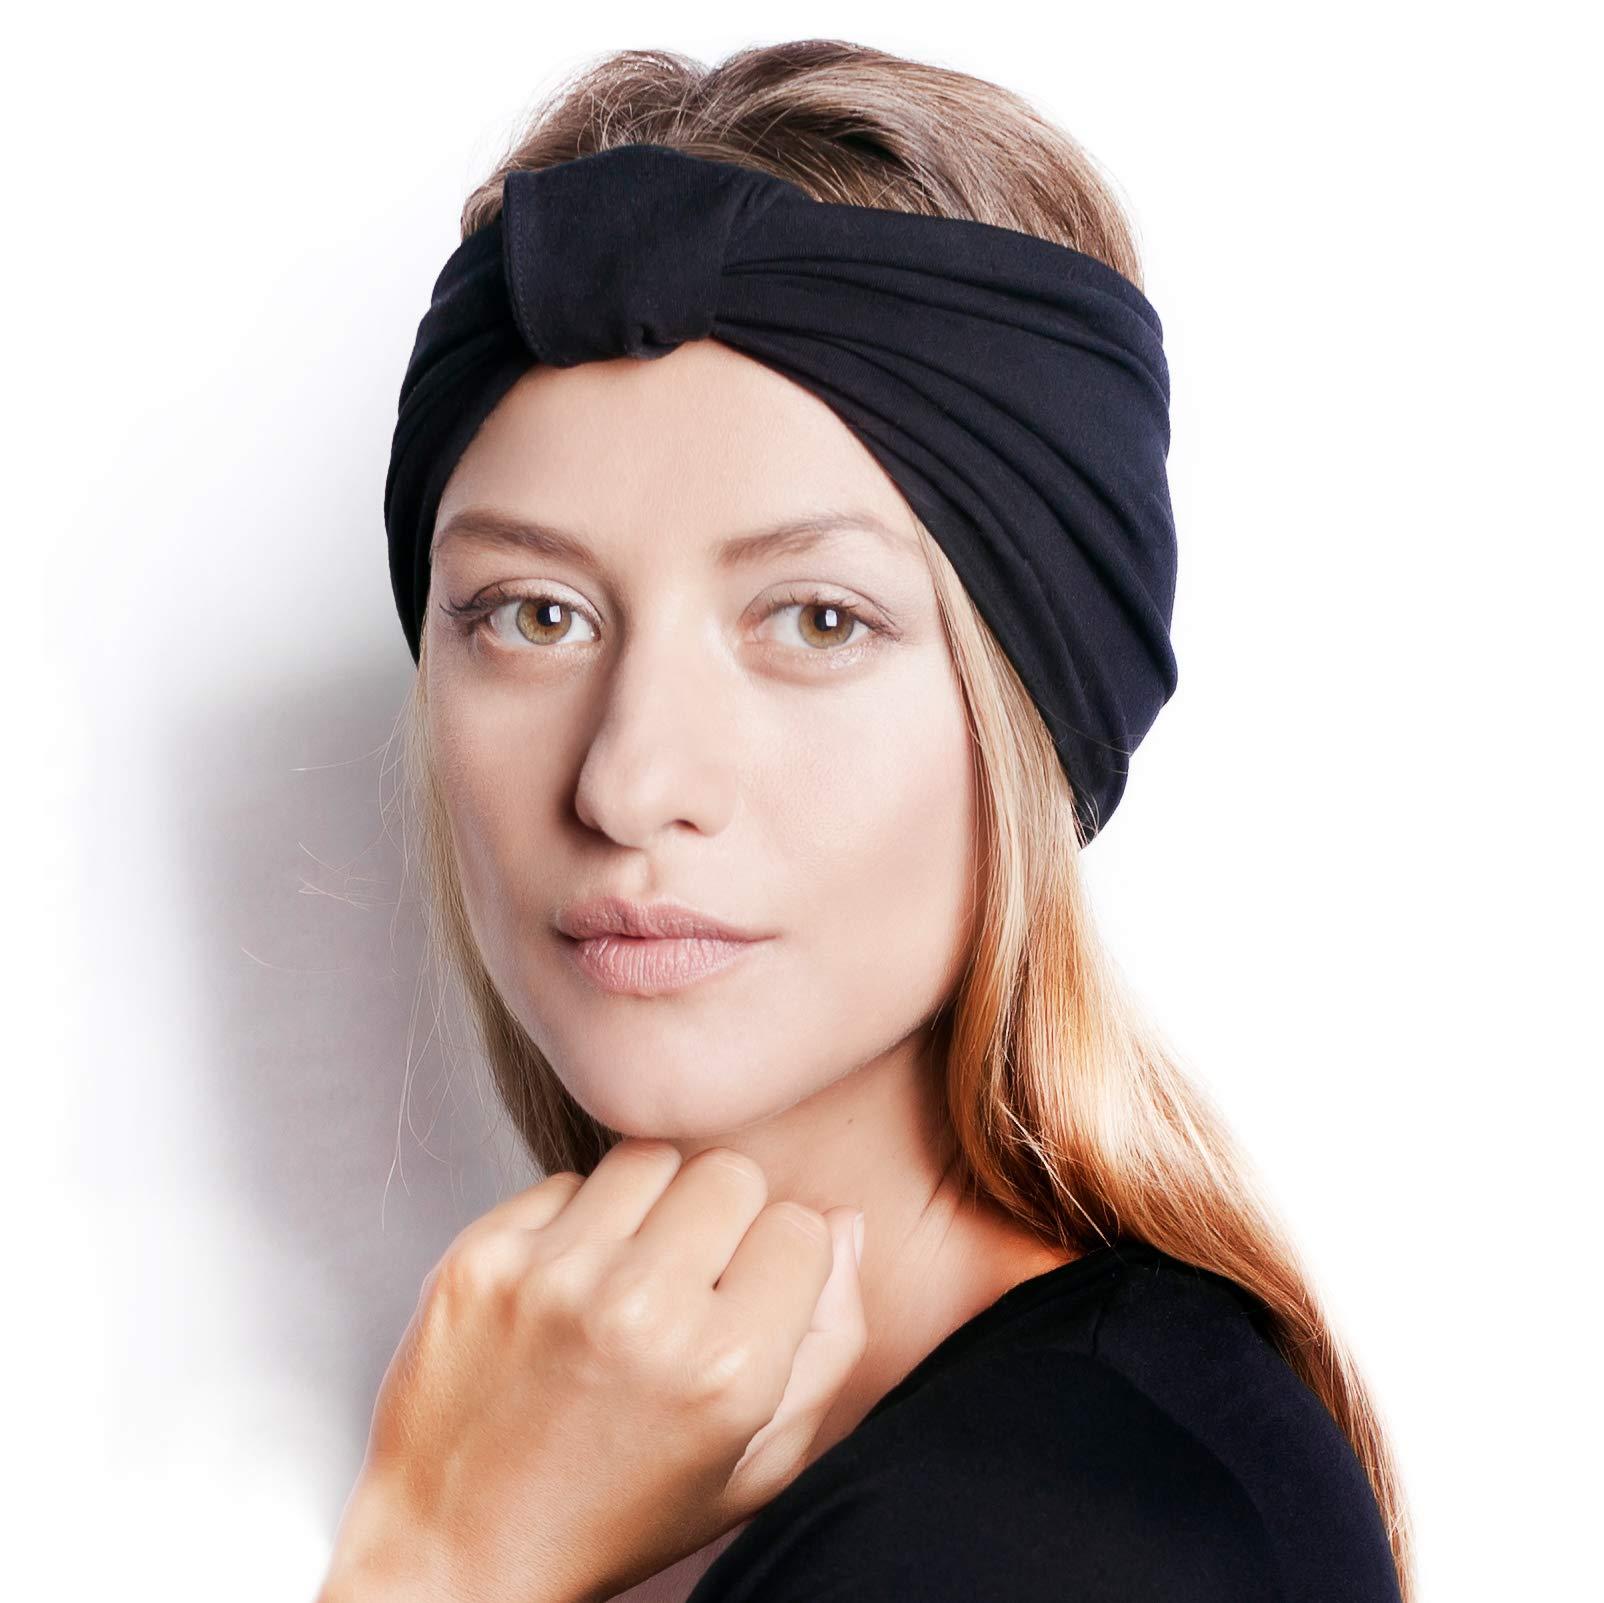 BLOM Original Multi Style Headband. for Women Yoga Fashion Workout Running  Athletic Travel. Wear 695d87d904